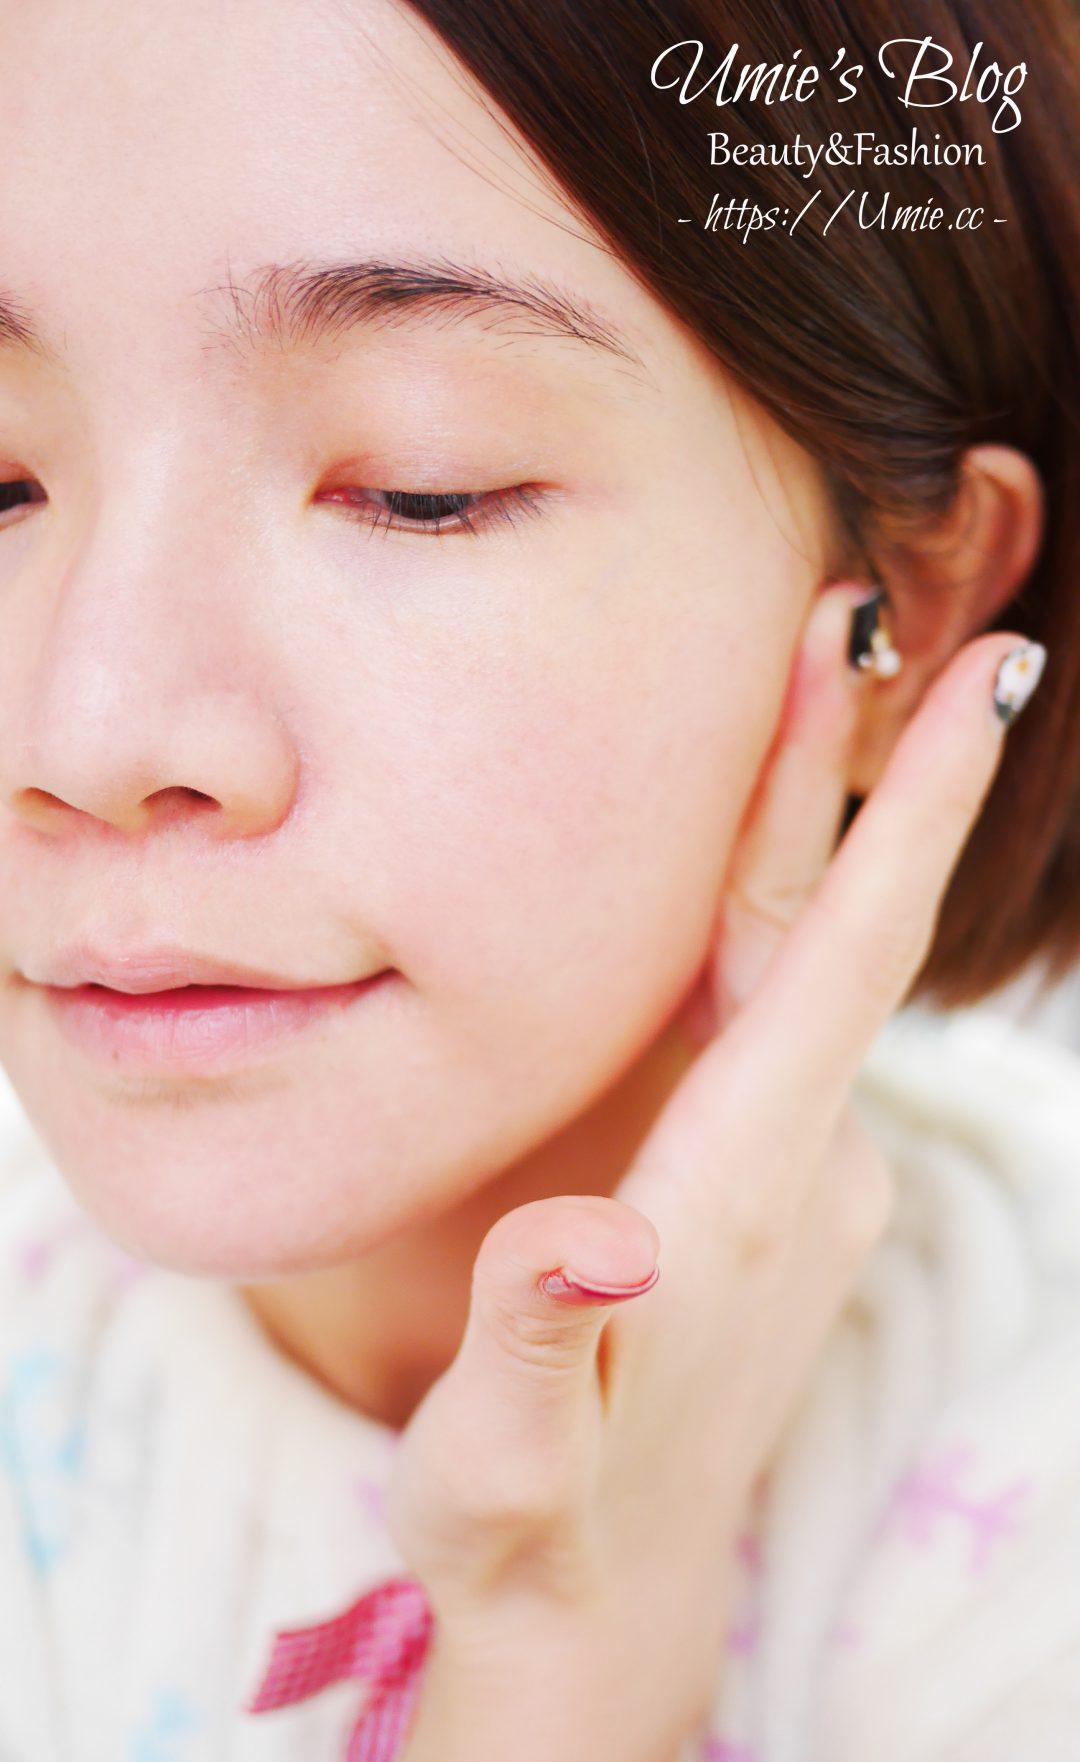 Lapiel潤肌夜用美容液,痘痘粉刺肌必試|日本直送, 使用2個月後真實心得!